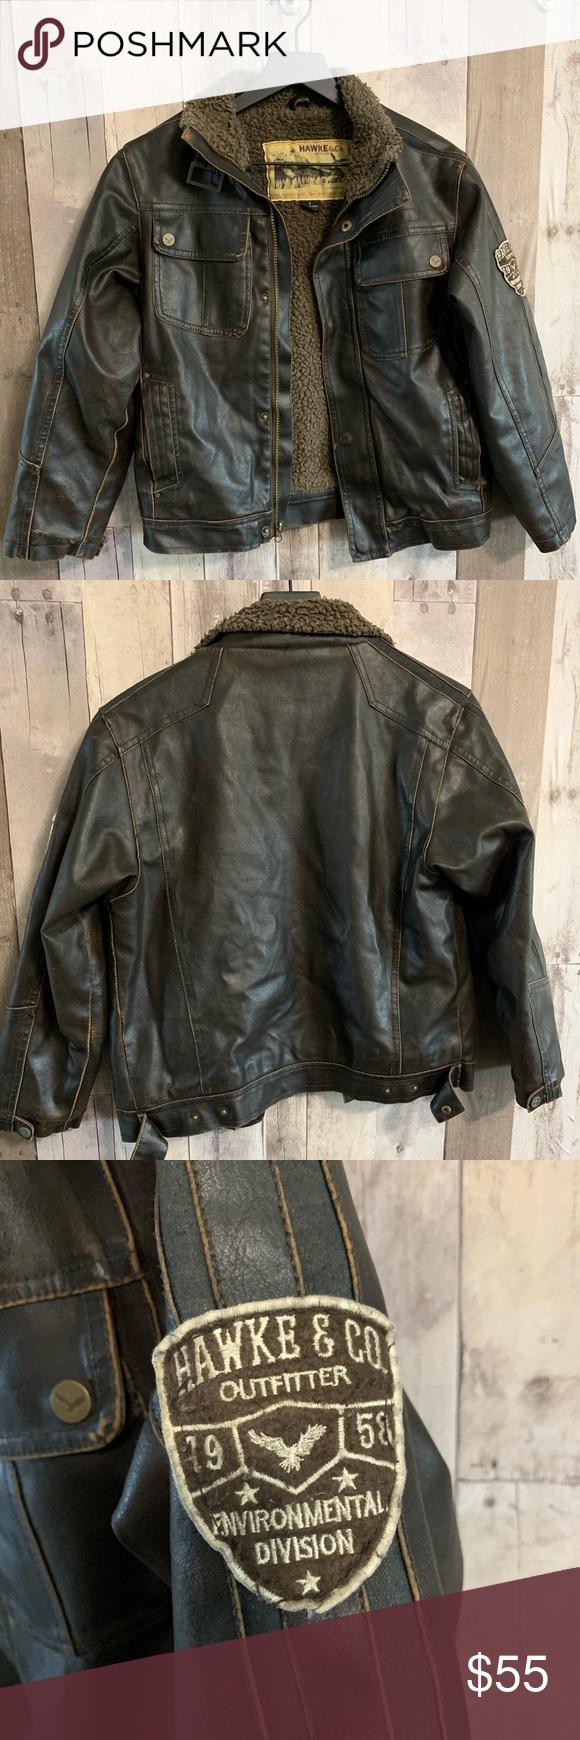 Hawke Co Outfitters Youth Jacket 8 Youth Jackets Jackets Flight Bomber Jacket [ 1740 x 580 Pixel ]